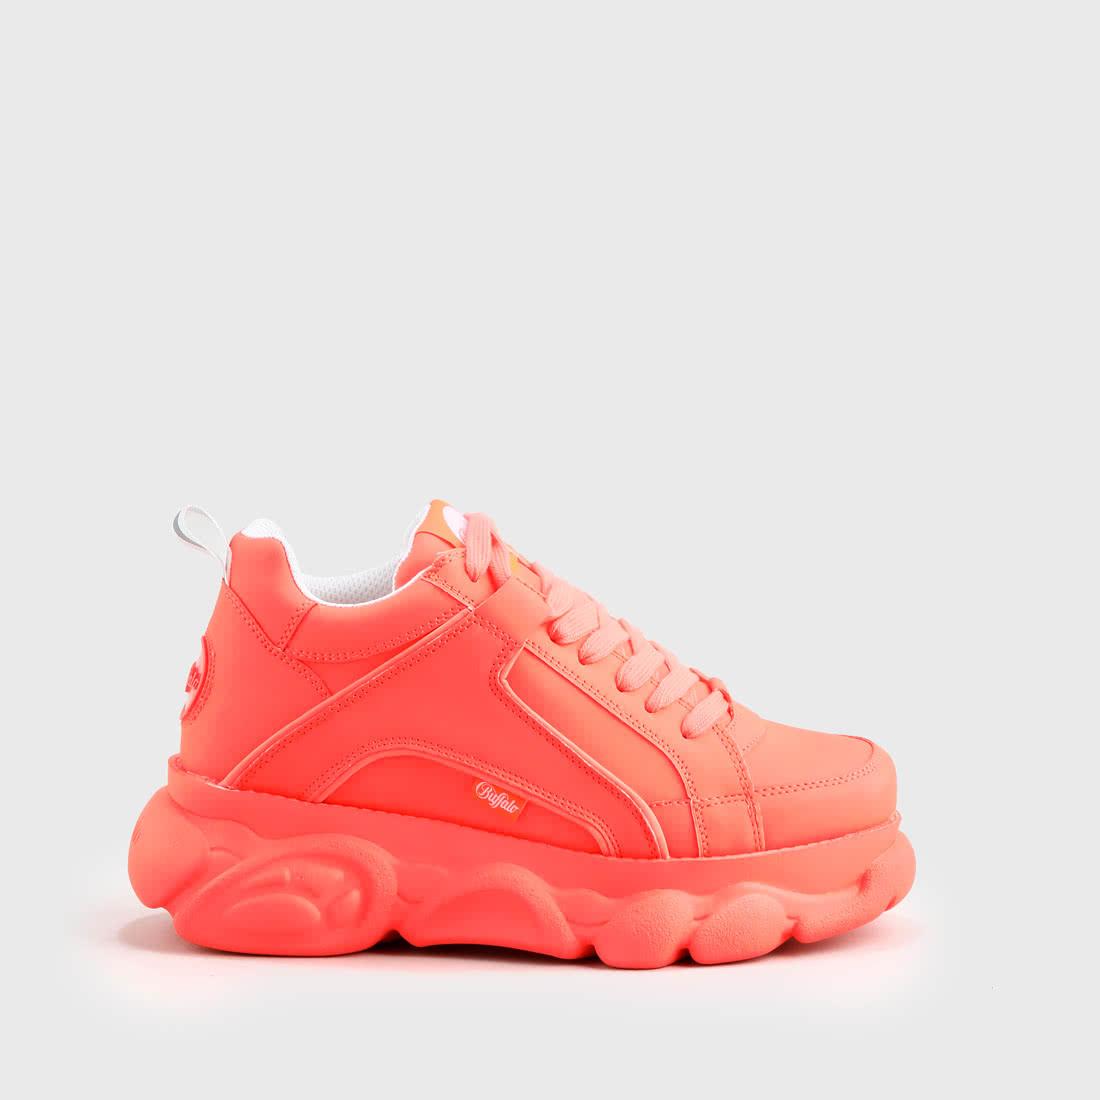 Cld Orange Corin Cld Sneaker Corin Sneaker Neon ARc35Lq4jS